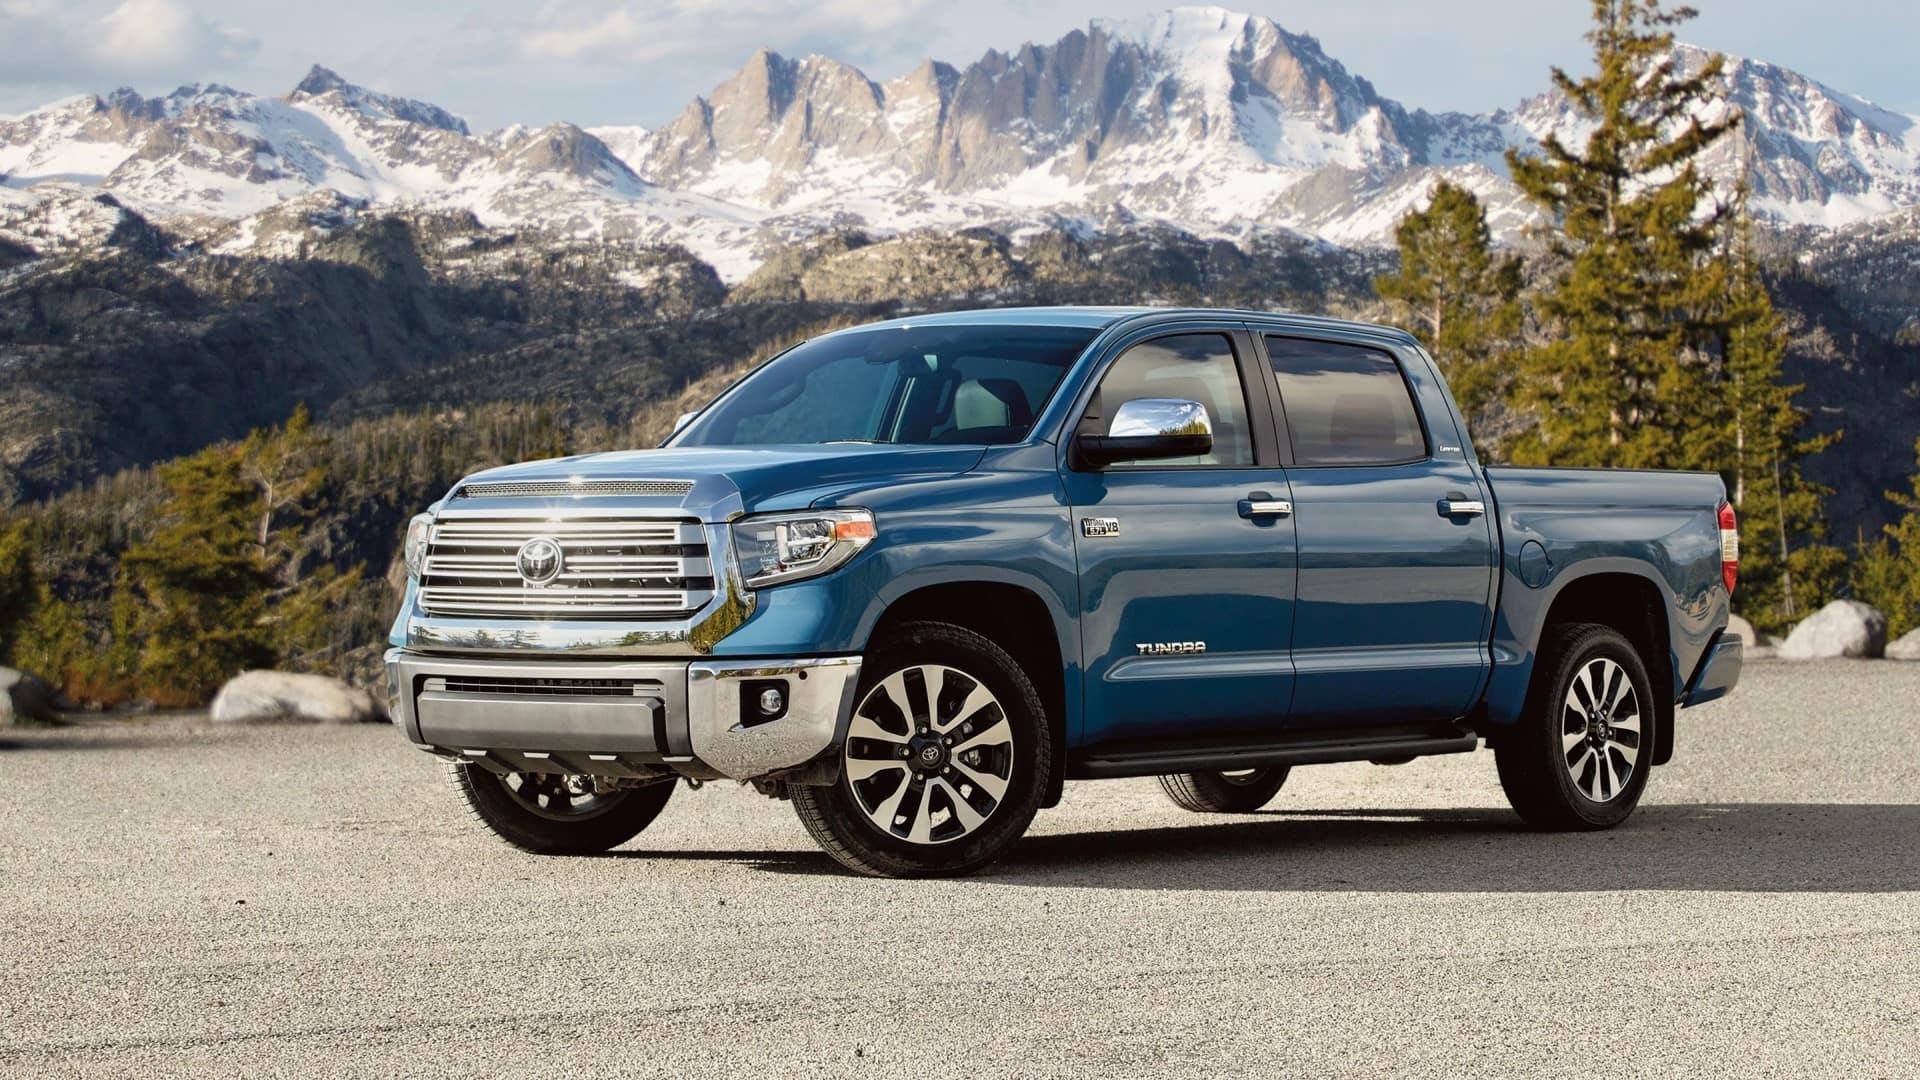 Toyota_Tundra_Parked_Mountain_Background